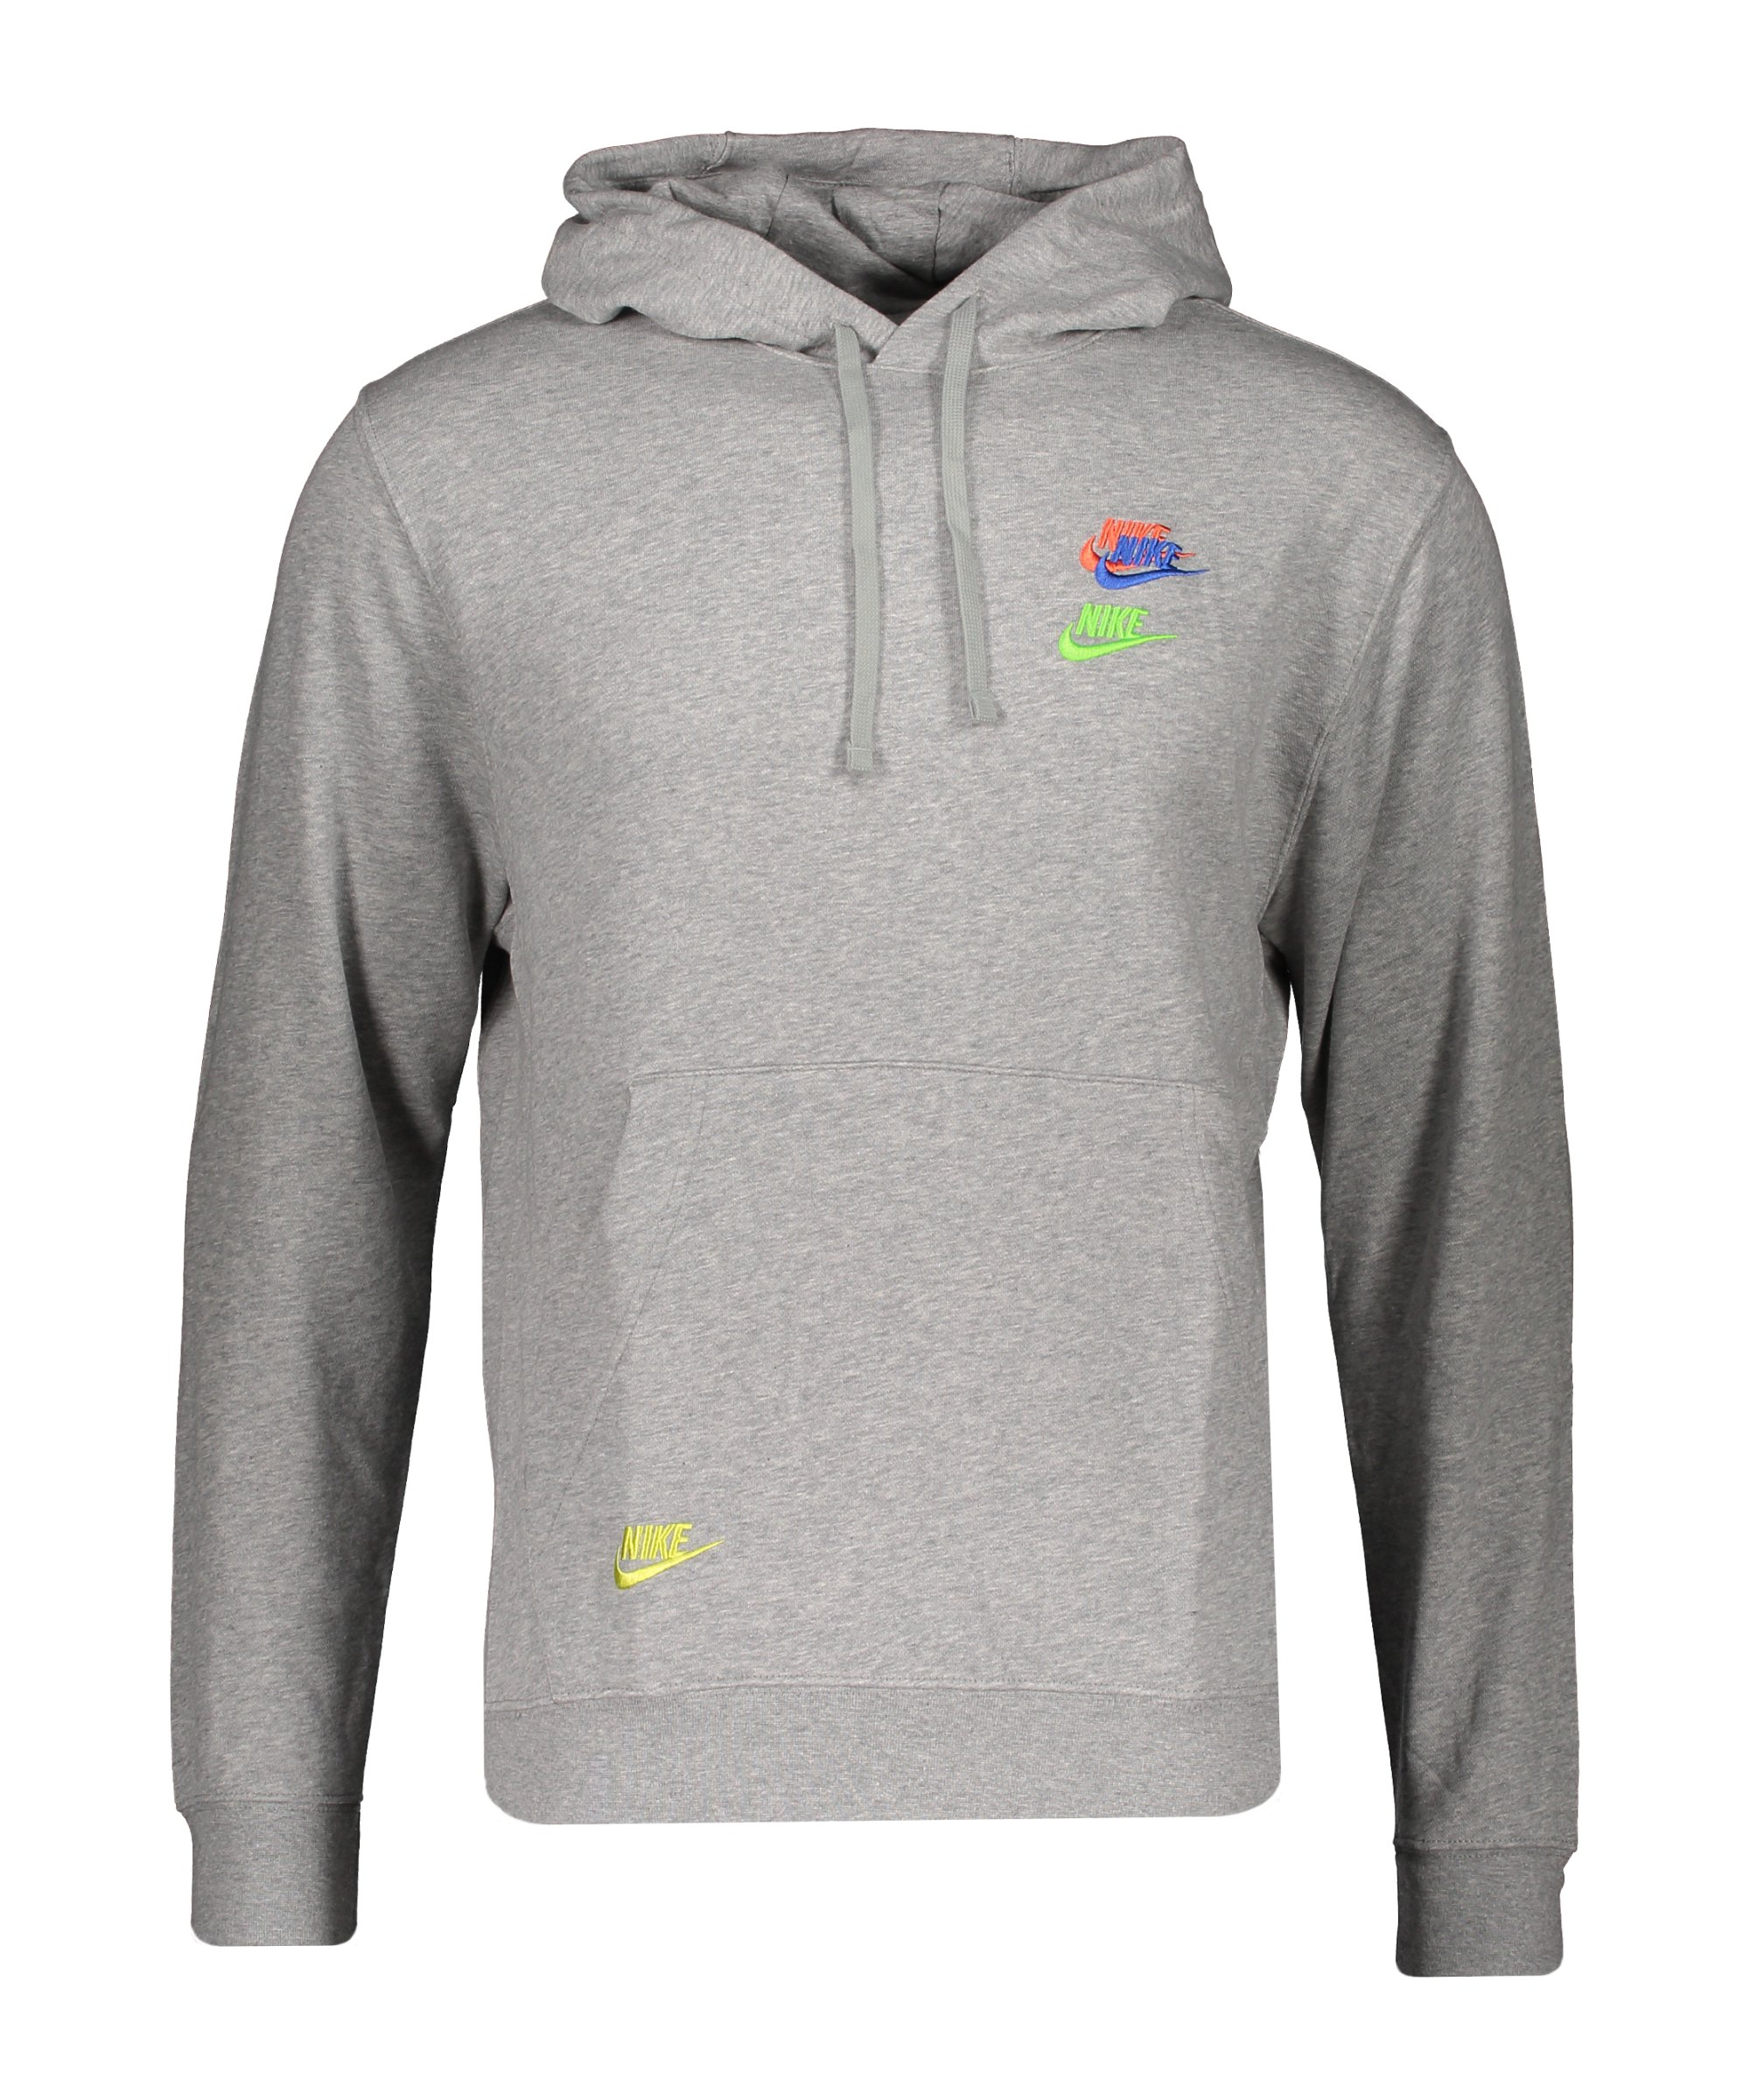 Nike Essentials+ French Terry Hoody F063 - grau